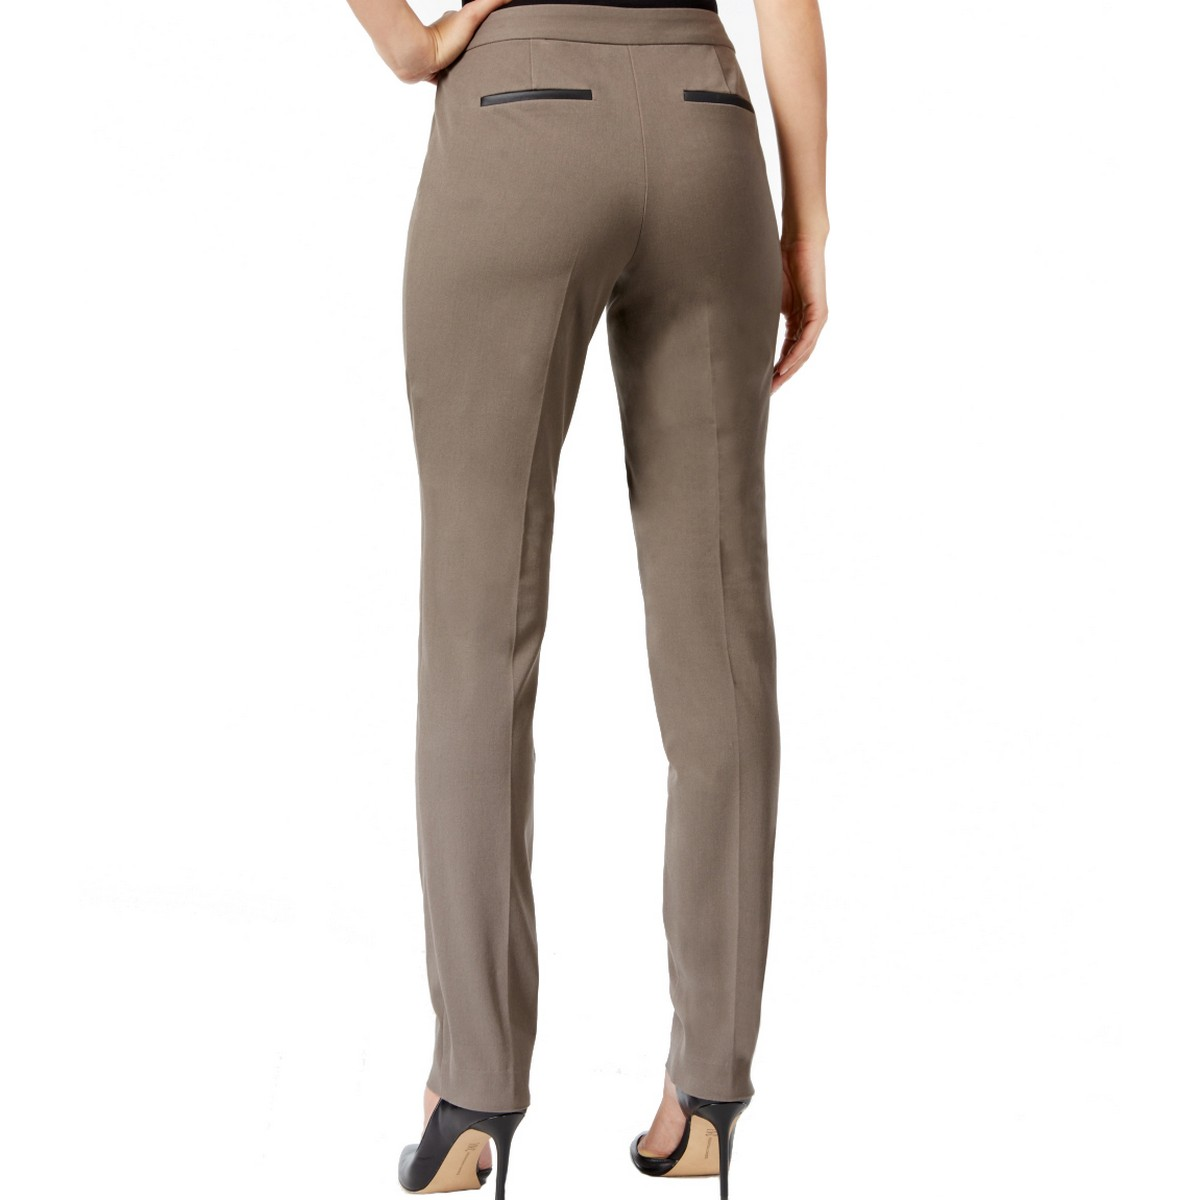 ALFANI-NEW-Women-039-s-Tummy-Control-Short-Length-Slim-Leg-Pants-TEDO thumbnail 4